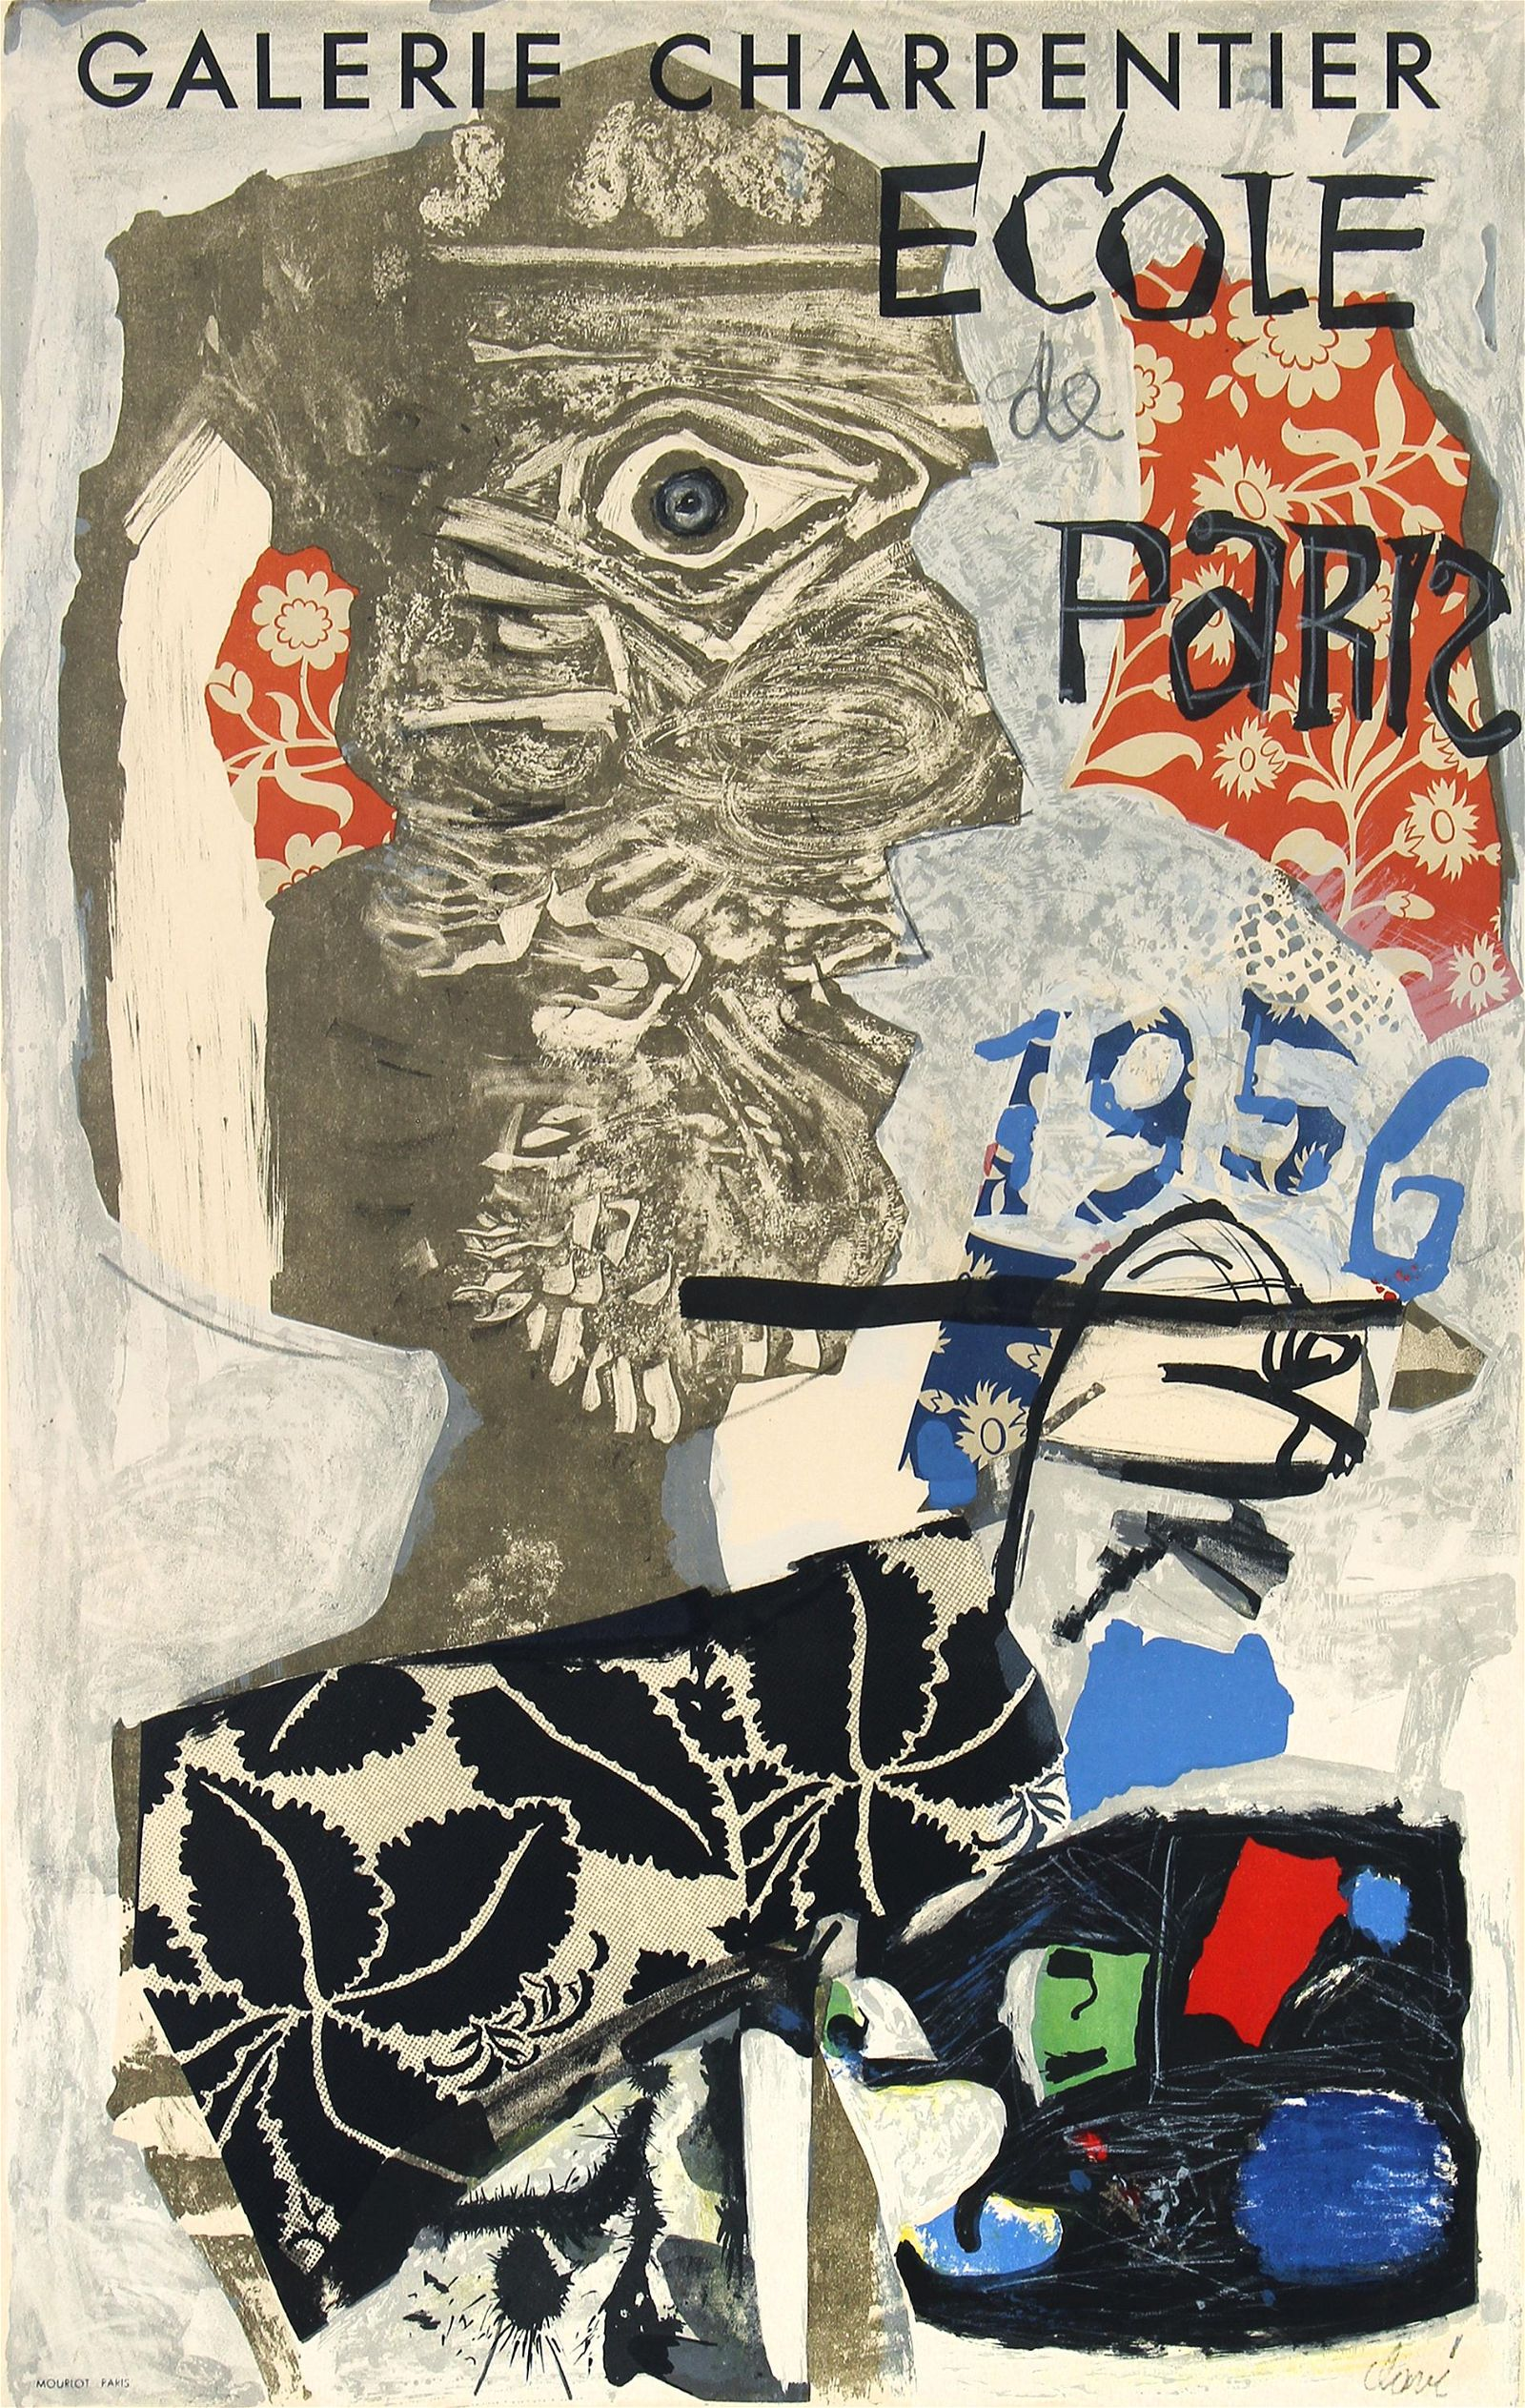 Antoni Clave, Galerie Charpentier (Exhibition Poster)